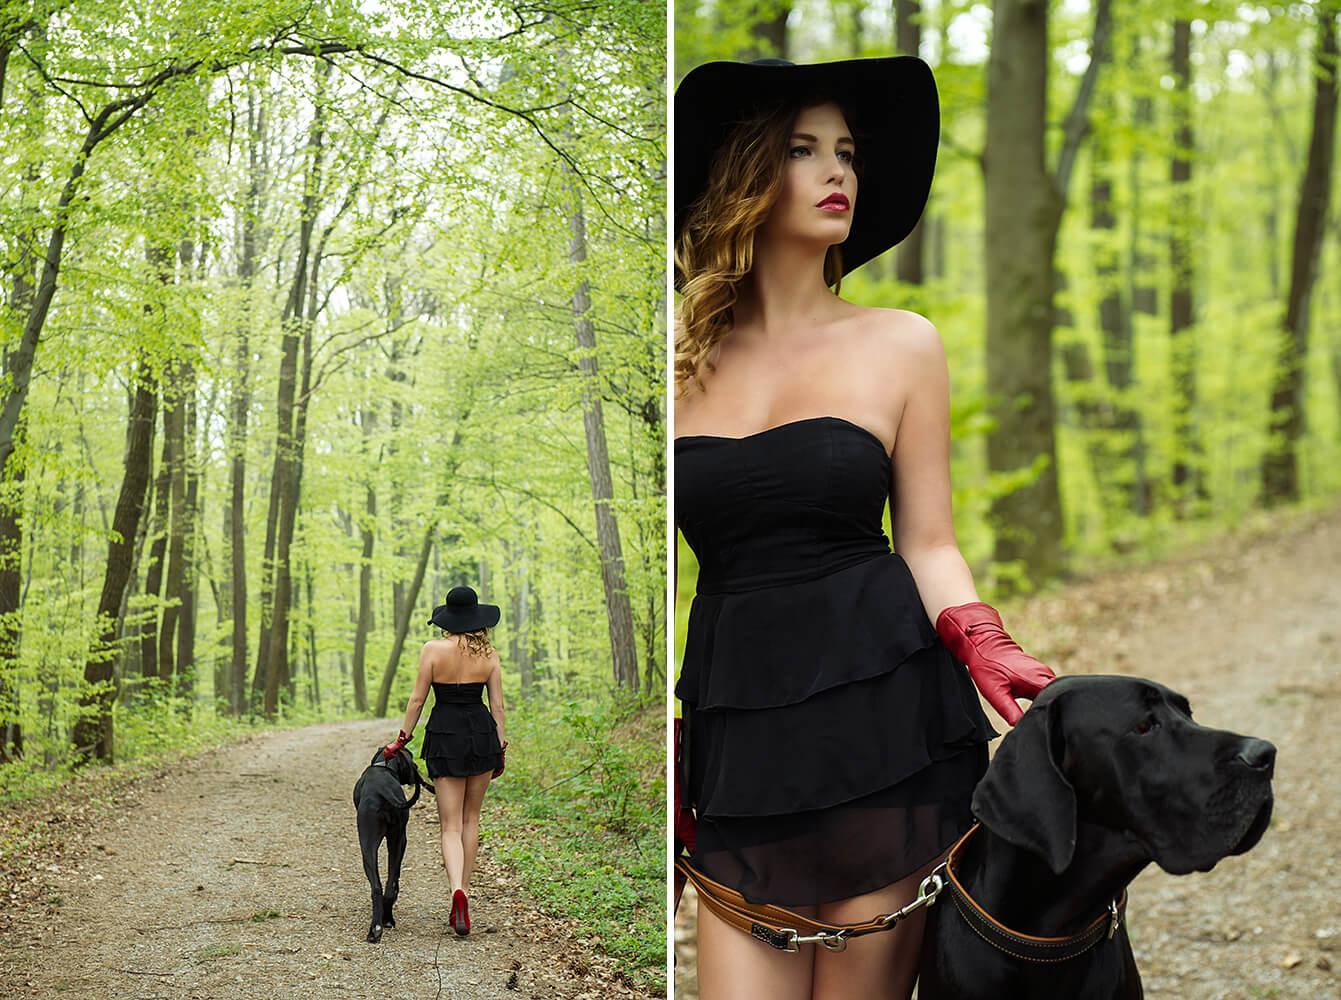 teresa kodolitsch, lena, hunde, dogge, boxer, pferd, frühling, shoot, fotografie, wien, niederösterreich, ursula schmitz